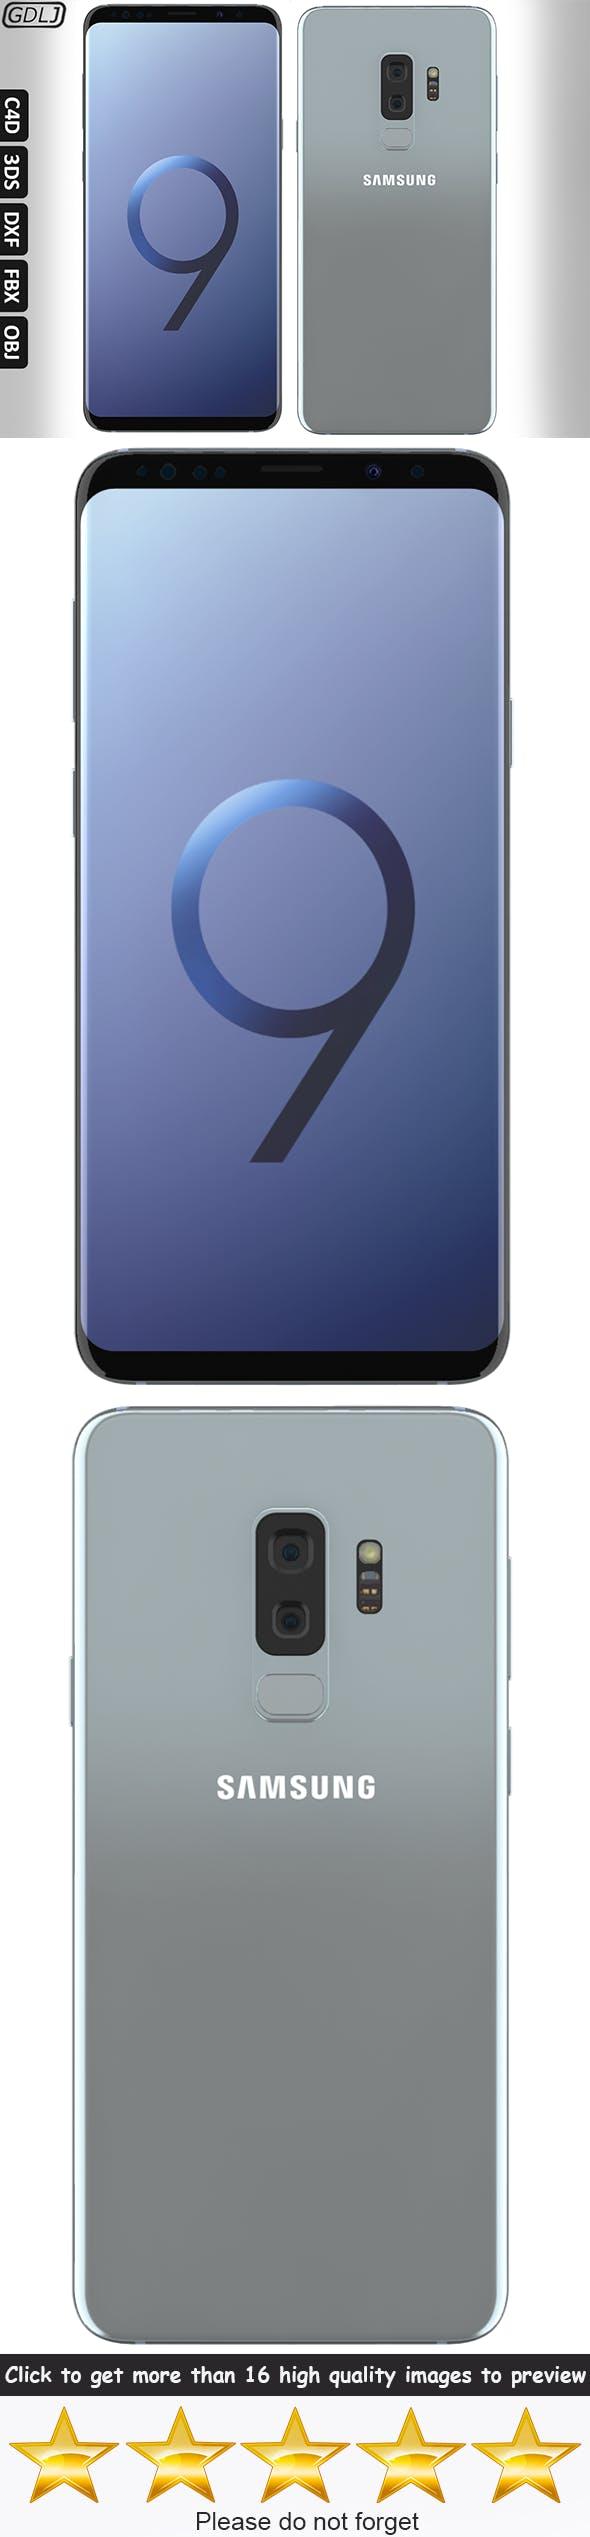 Samsung Galaxy S9 Plus Silver Titanium - 3DOcean Item for Sale